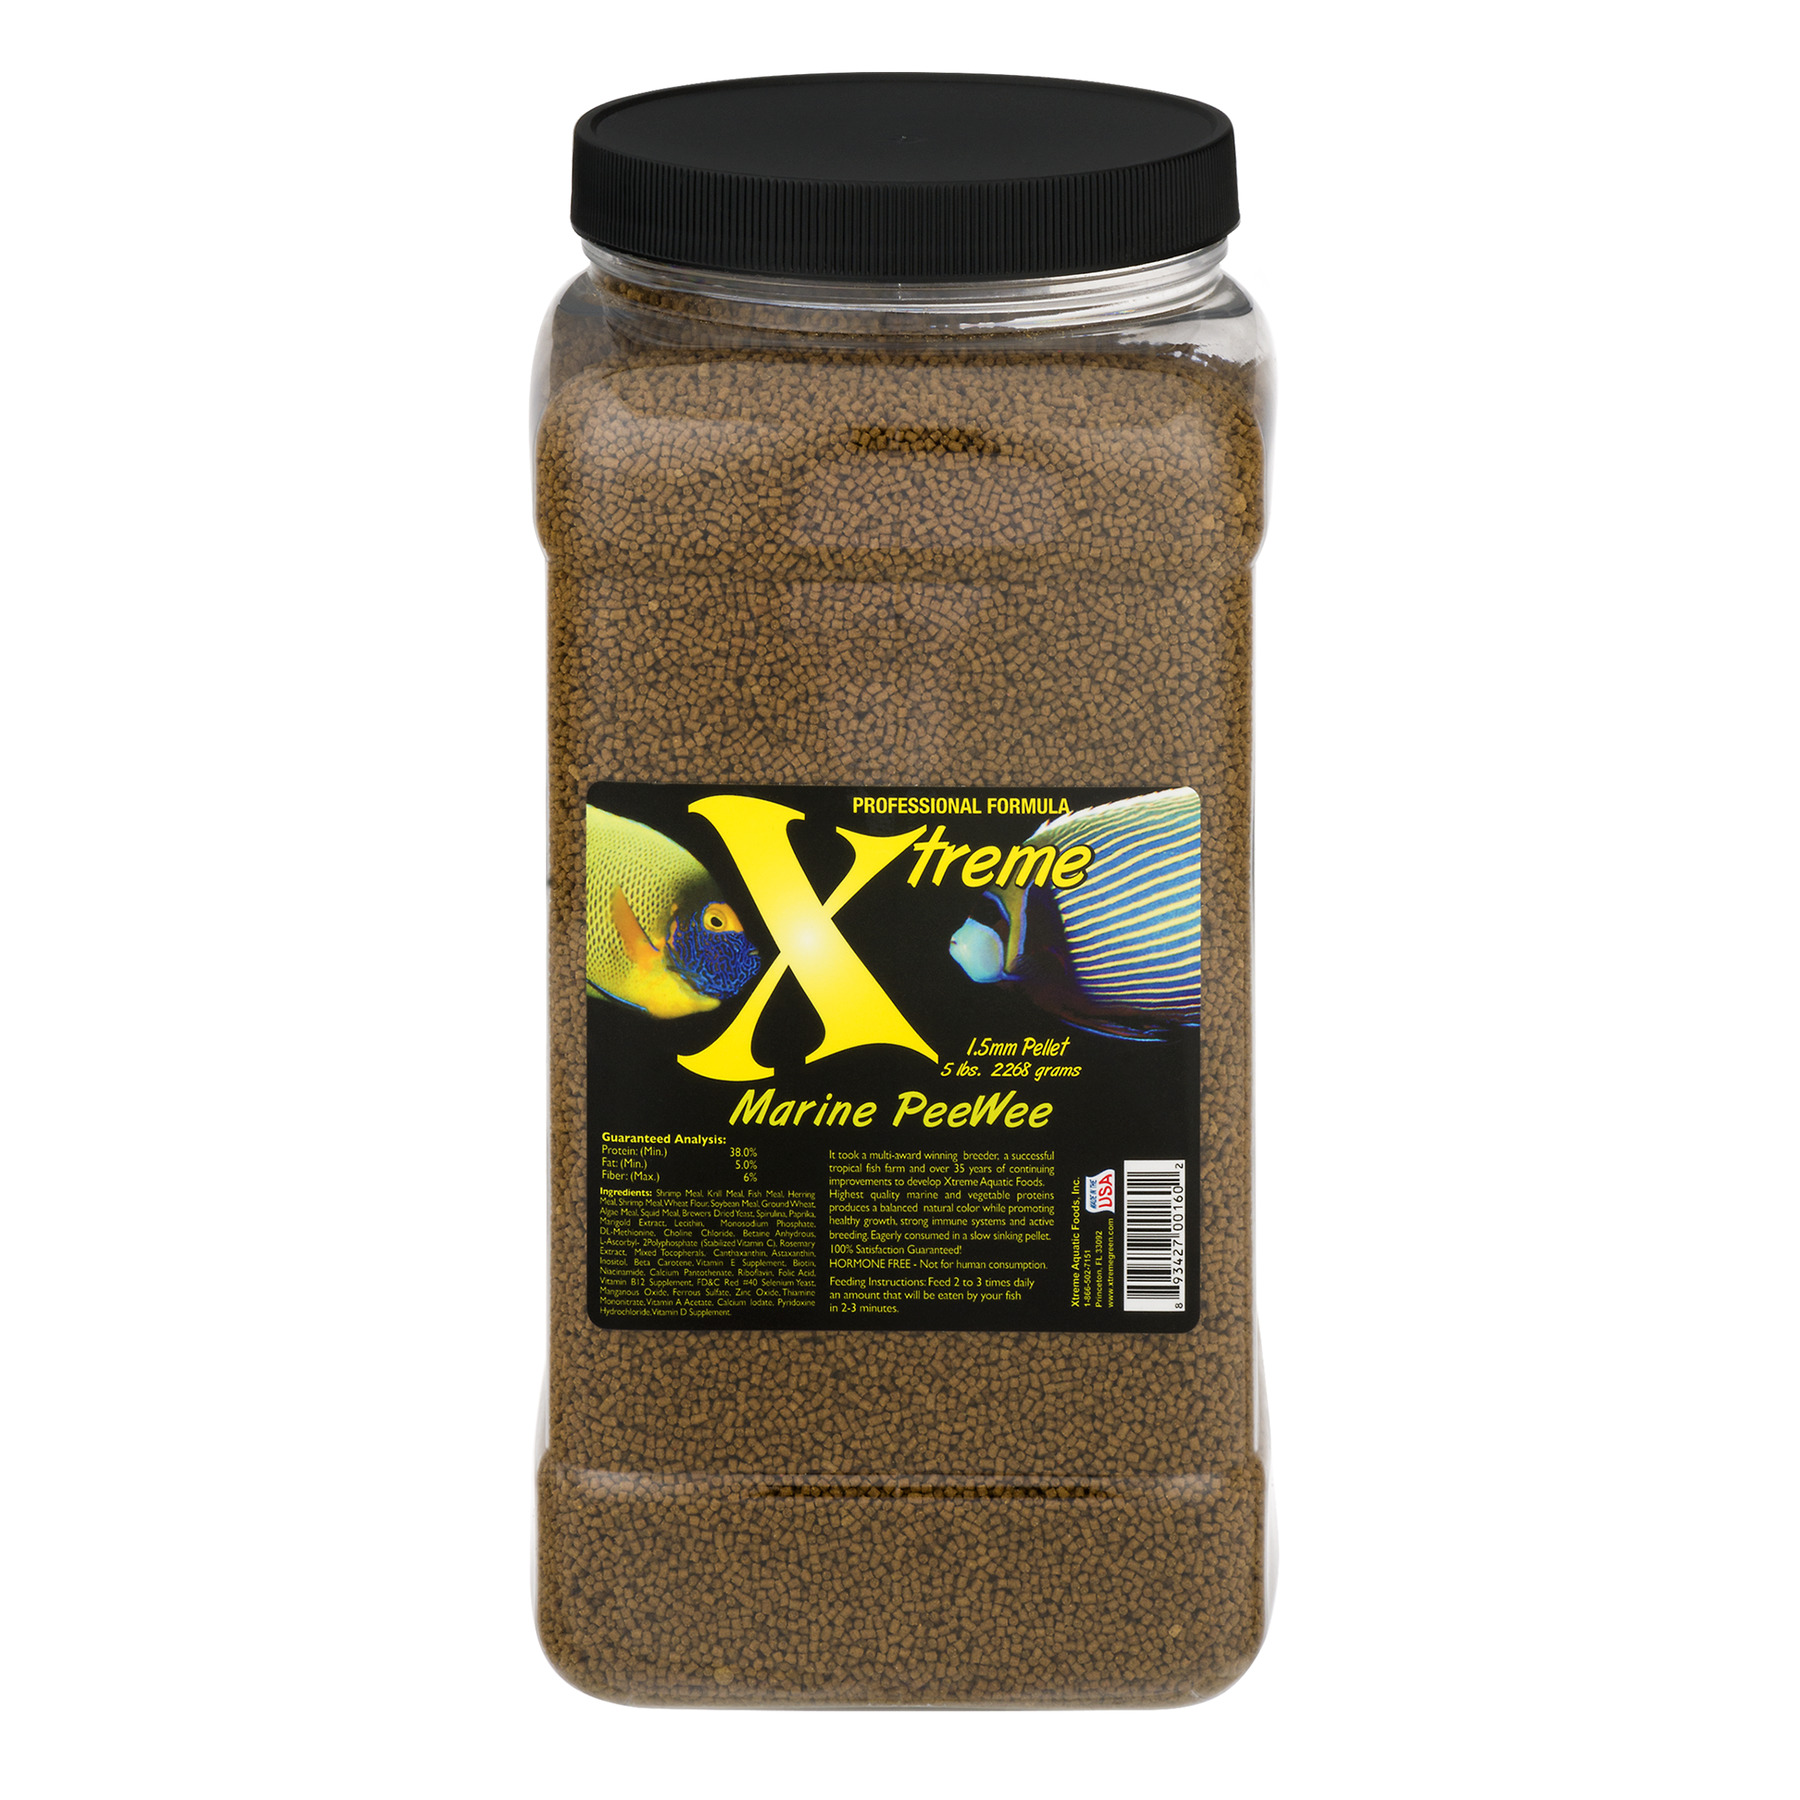 Xtreme Aquatic Marine PeeWee Fish Food Pellets, 80 oz